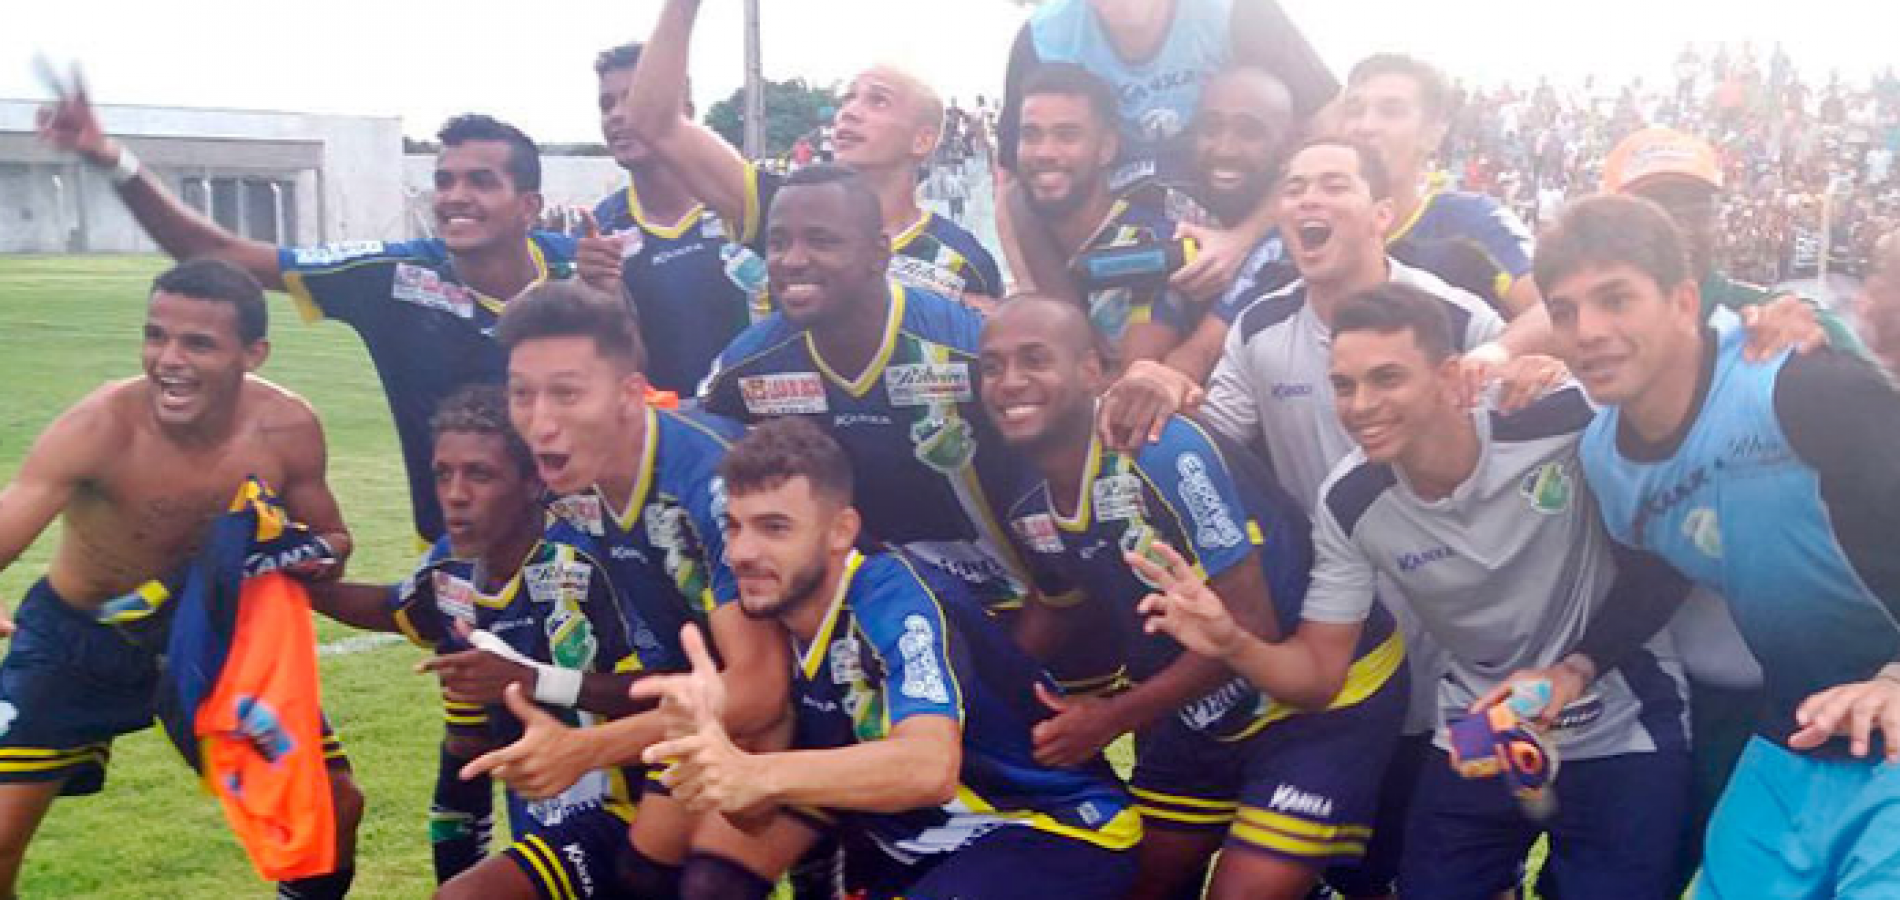 Time piauiense vence o Atlético (GO) e avança na Copa do Brasil